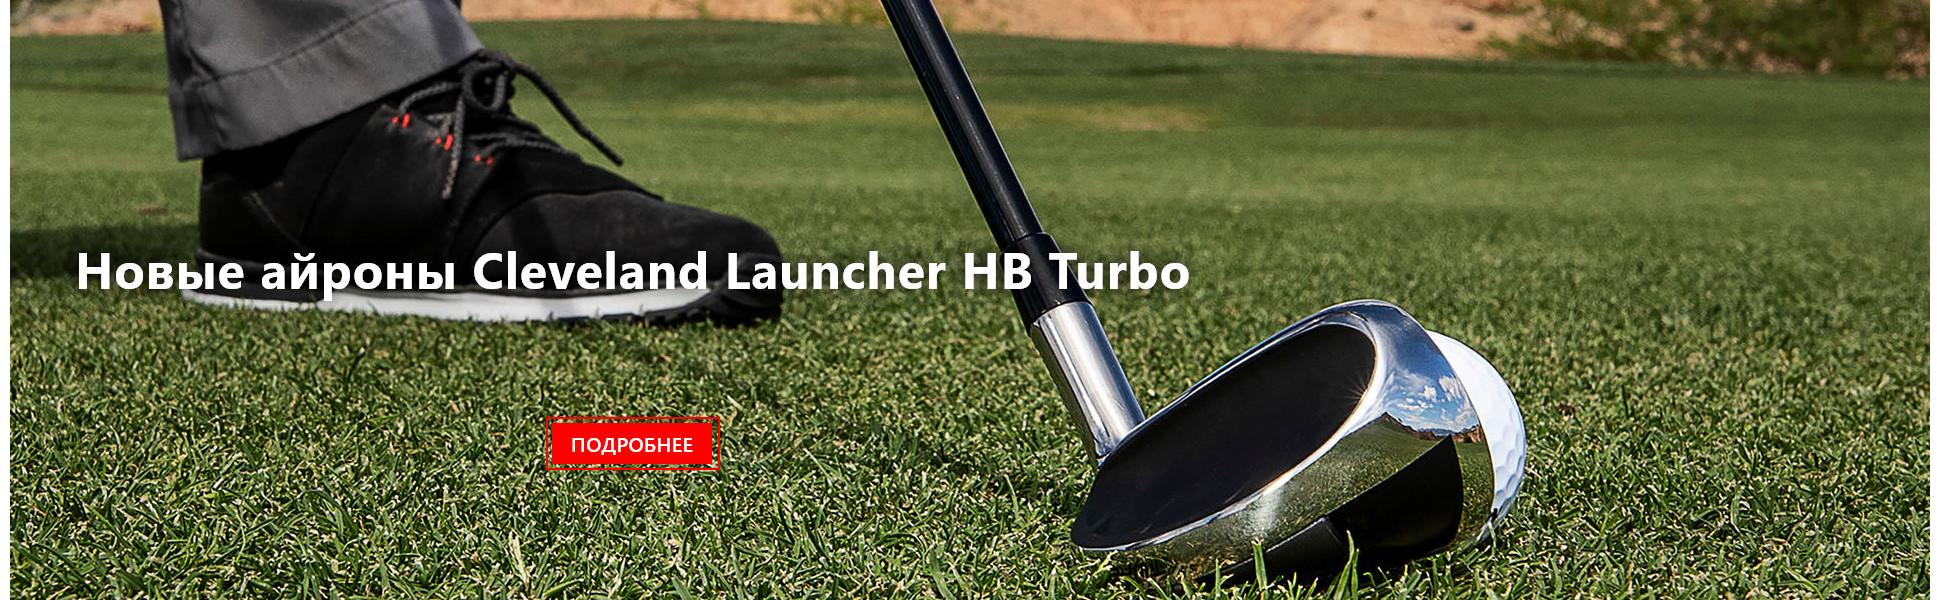 Новые айроны Cleveland Launcher HB Turbo